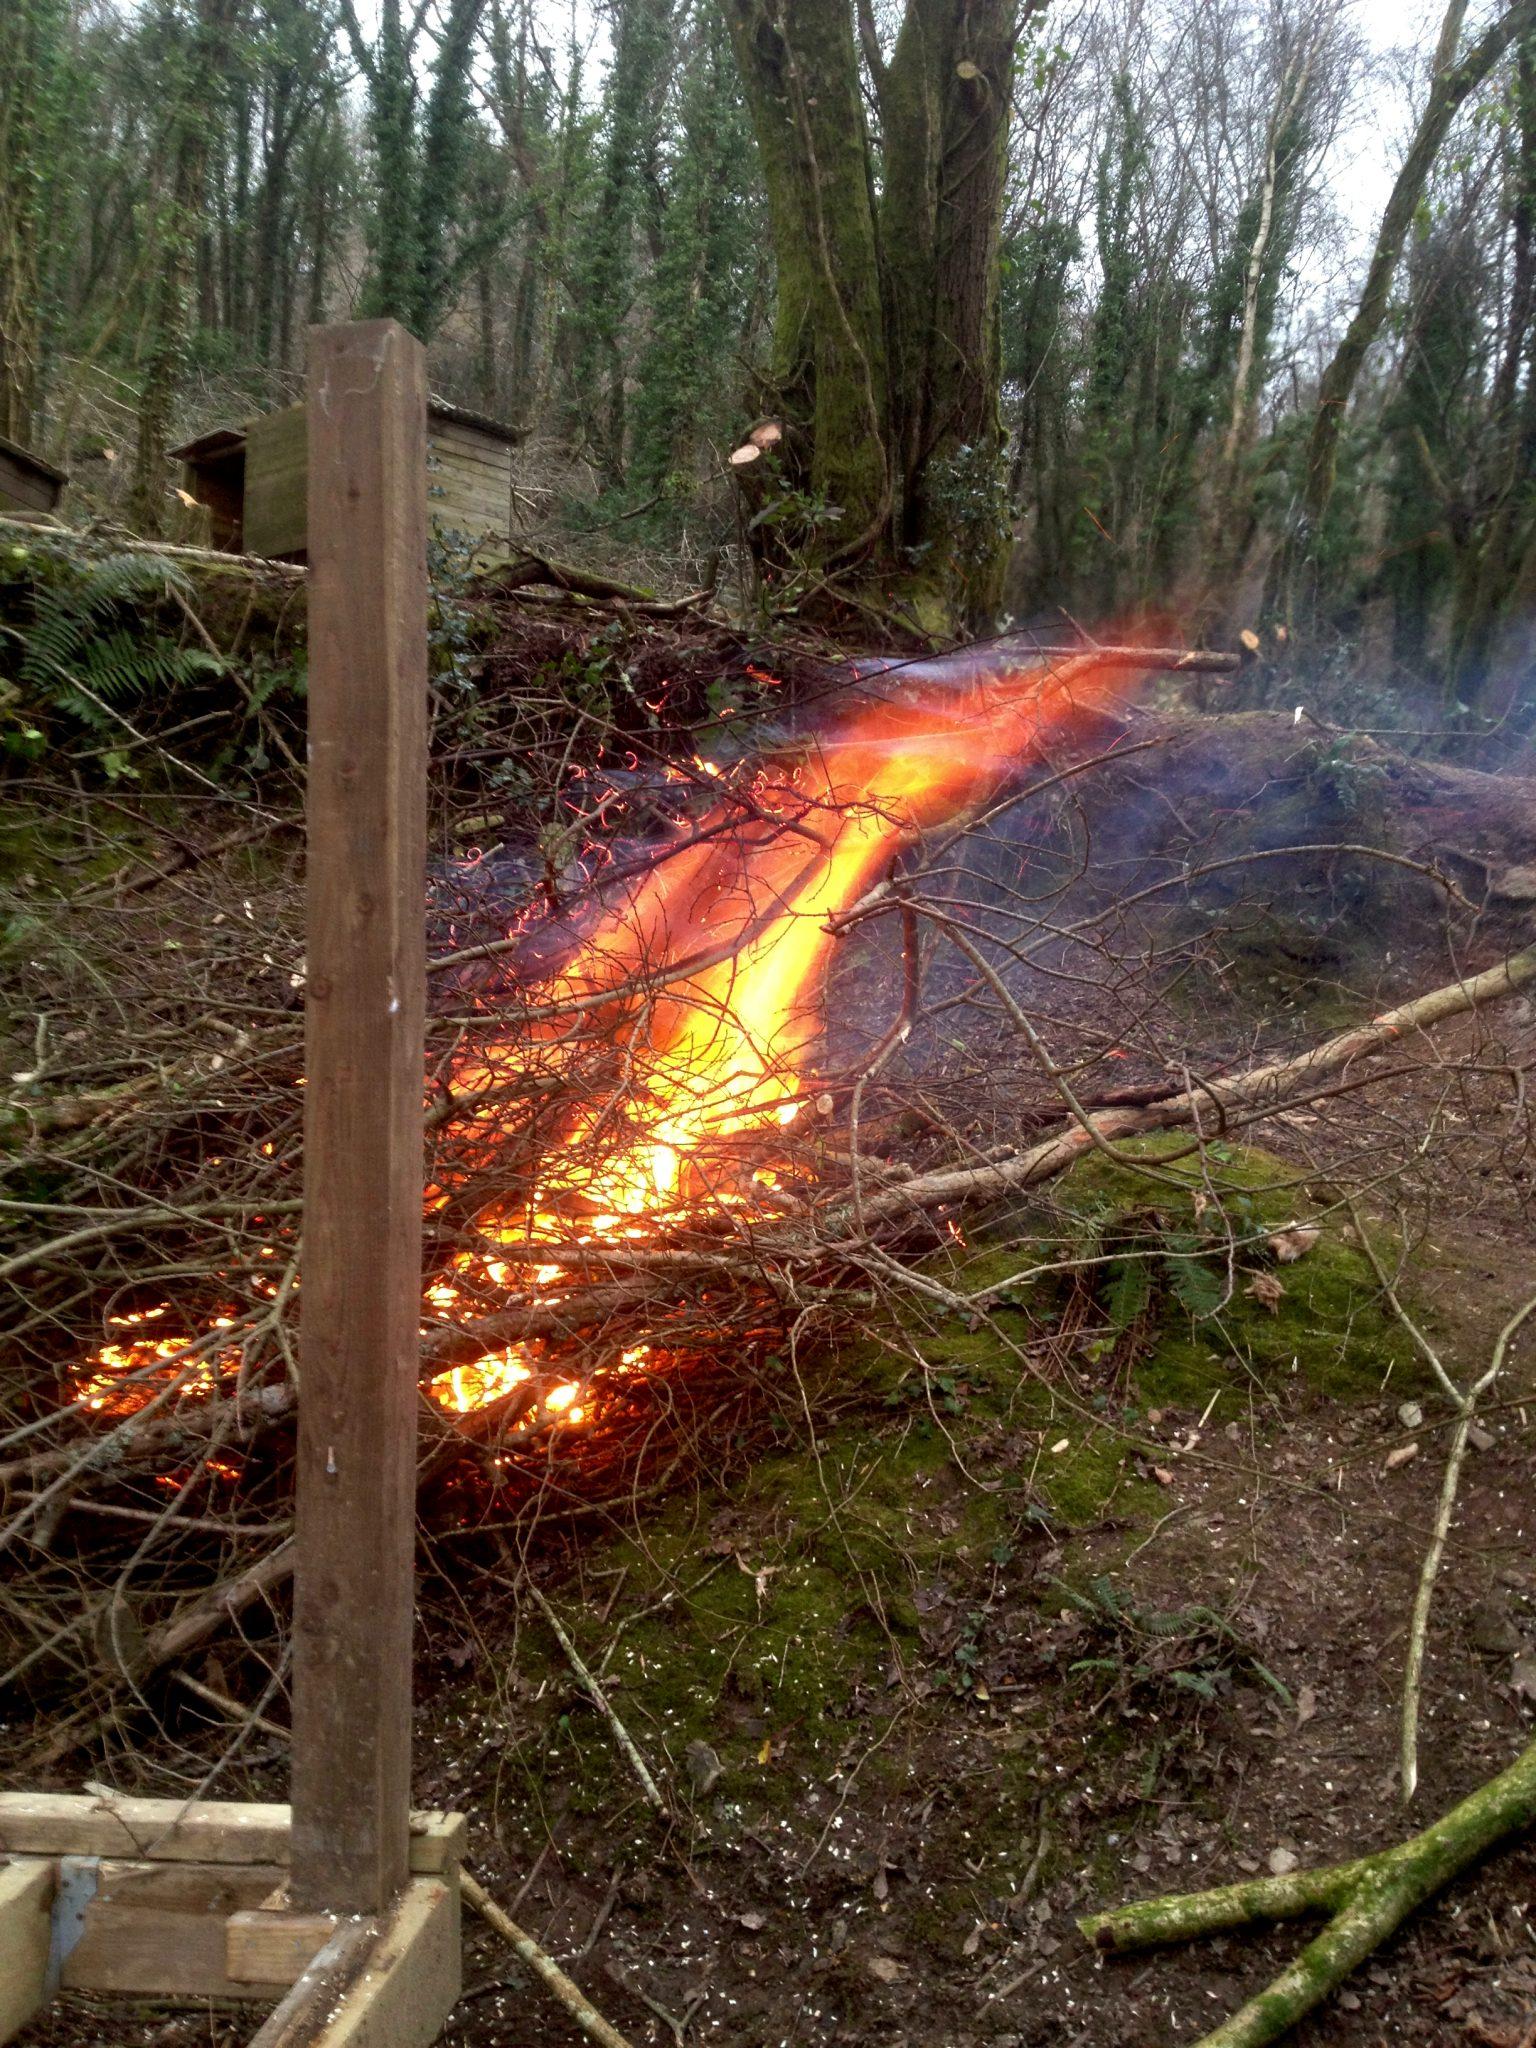 Bonfire at Wild Woods